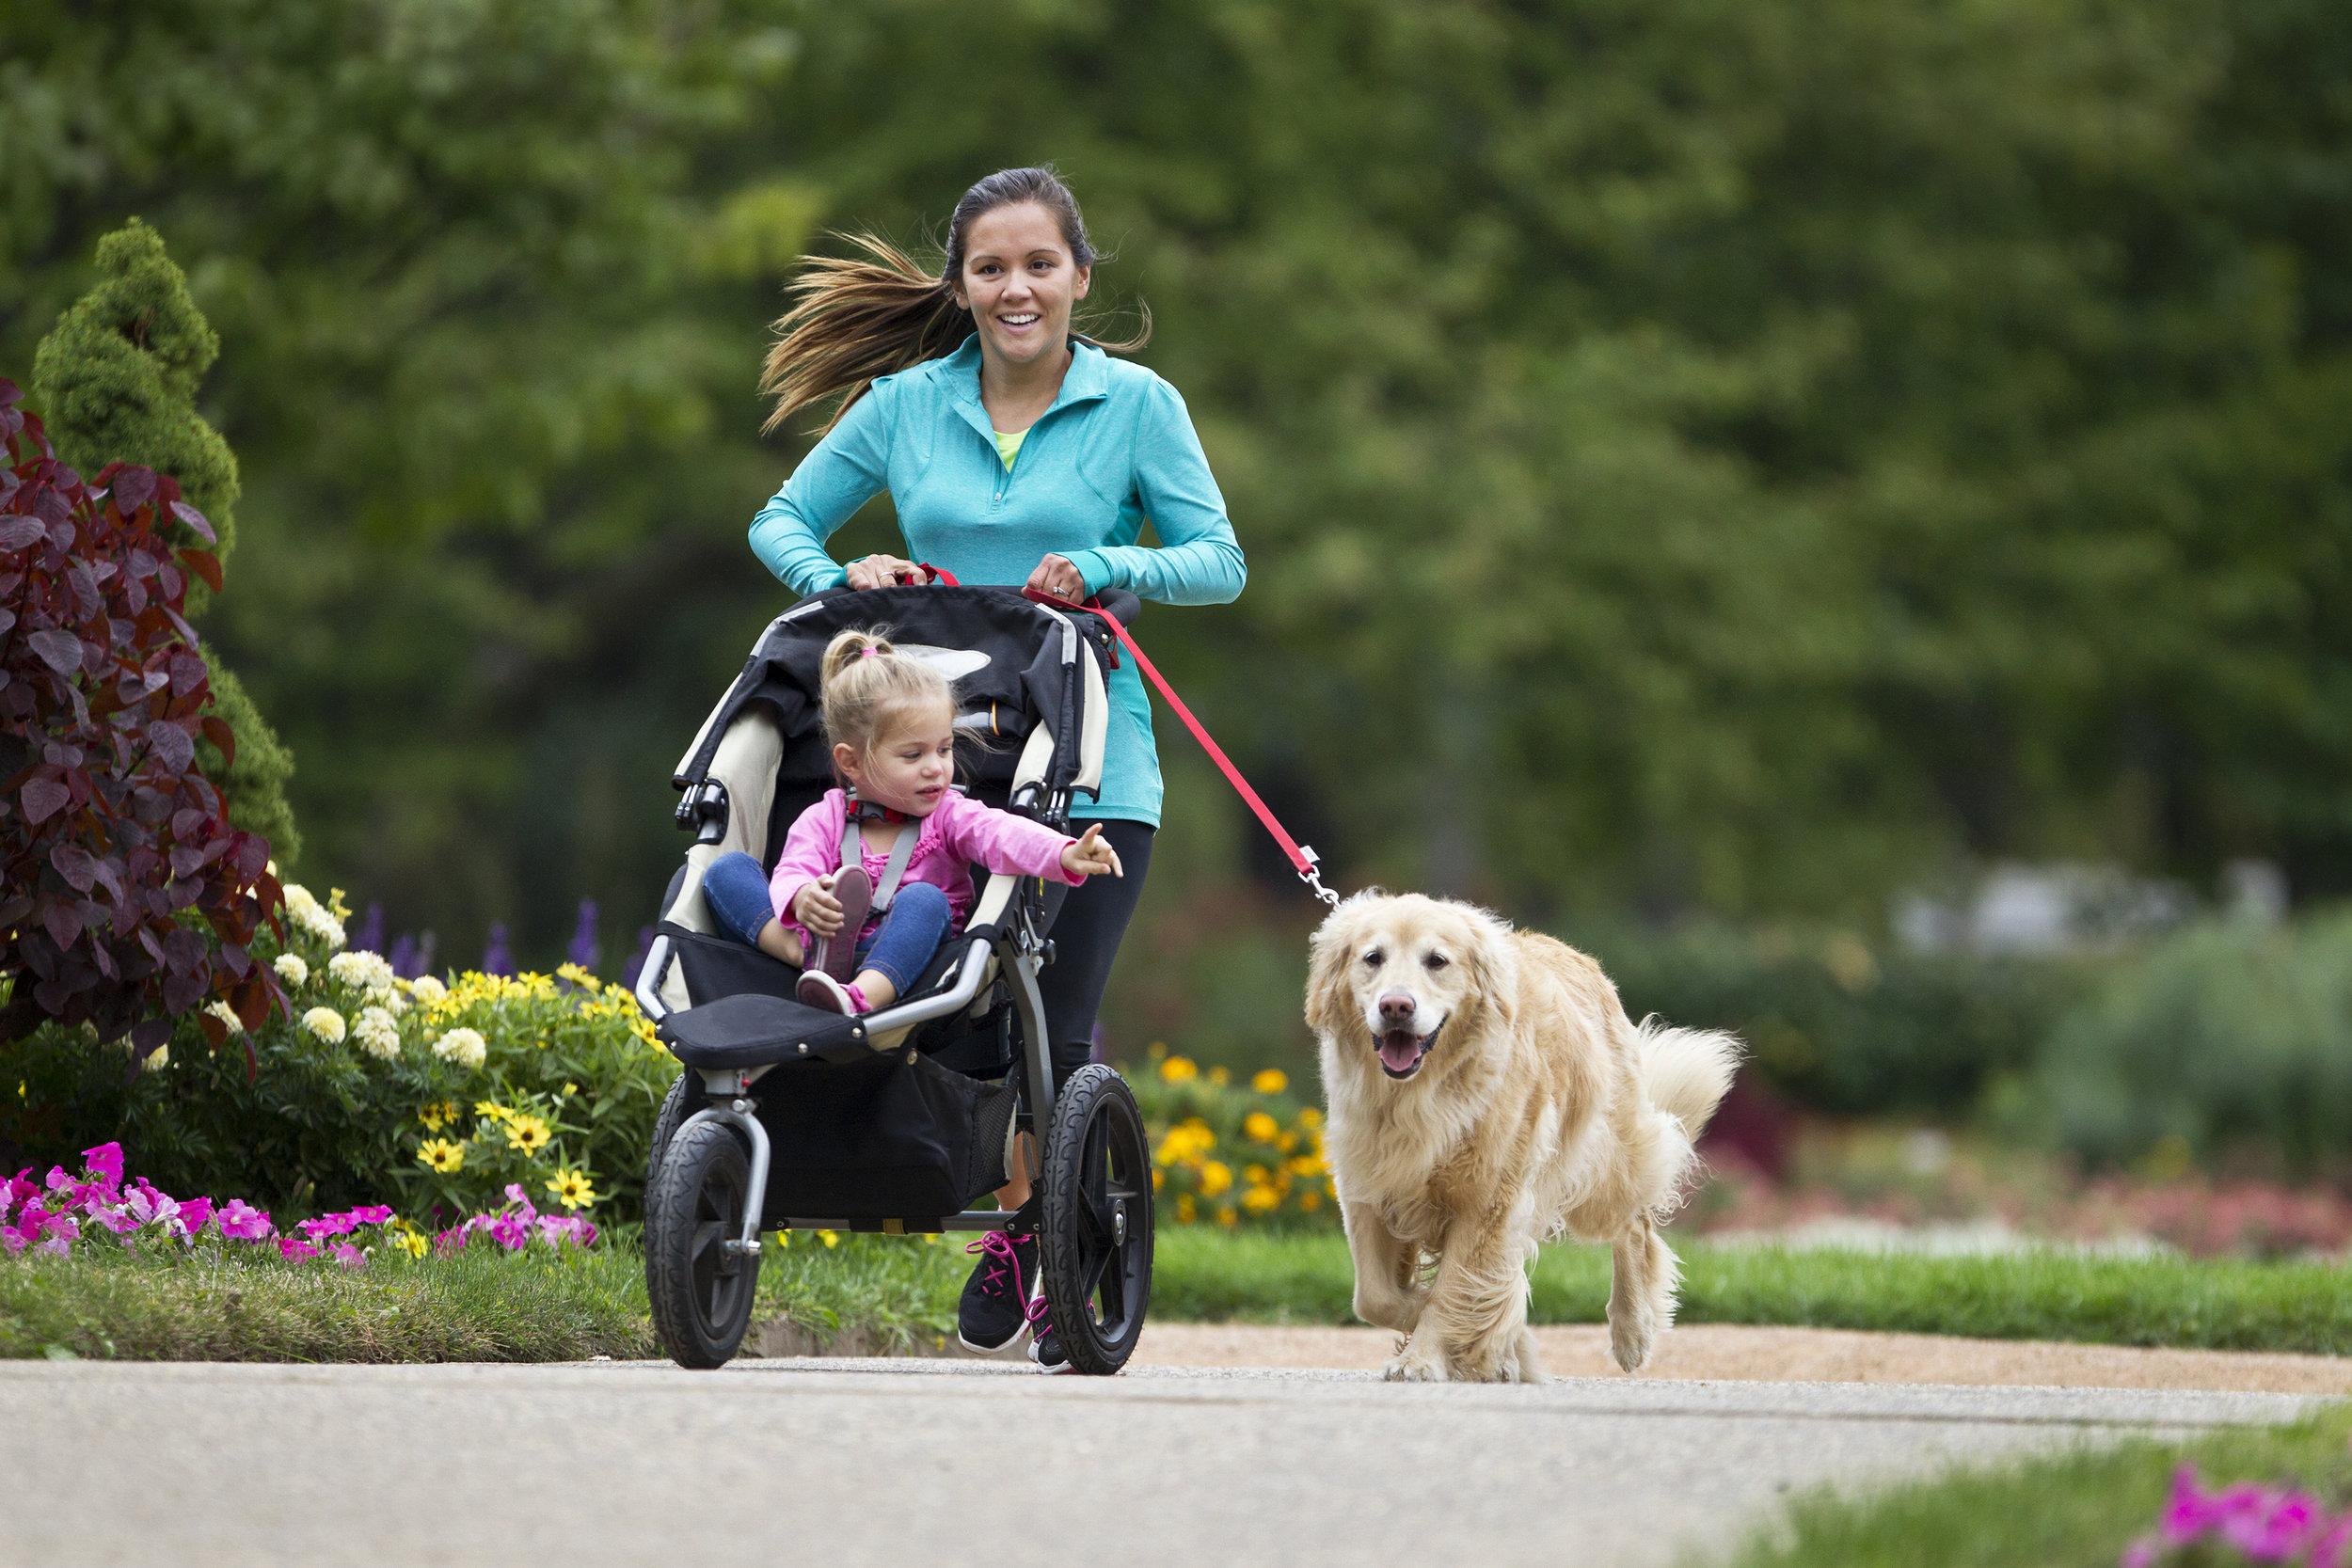 Family Dog Kid Running iStock-488155287.jpg